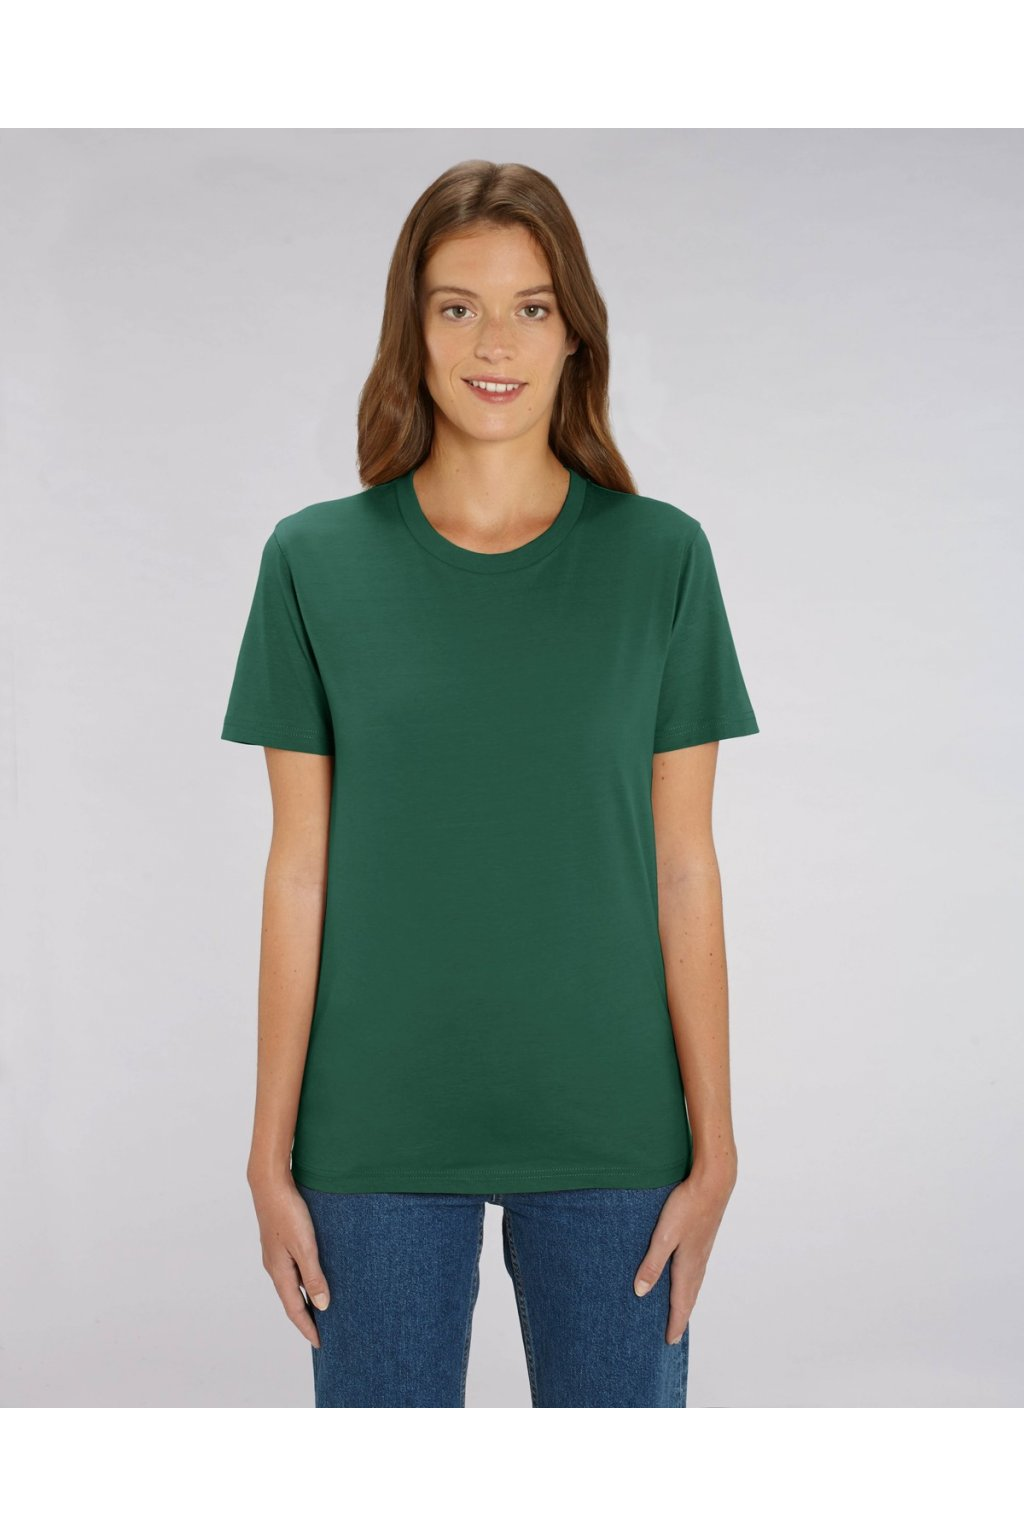 "Unisex tričko ""Creator"" tmavě zelené (Barva Tmavě zelená ""Bottle Green"", Velikost L)"